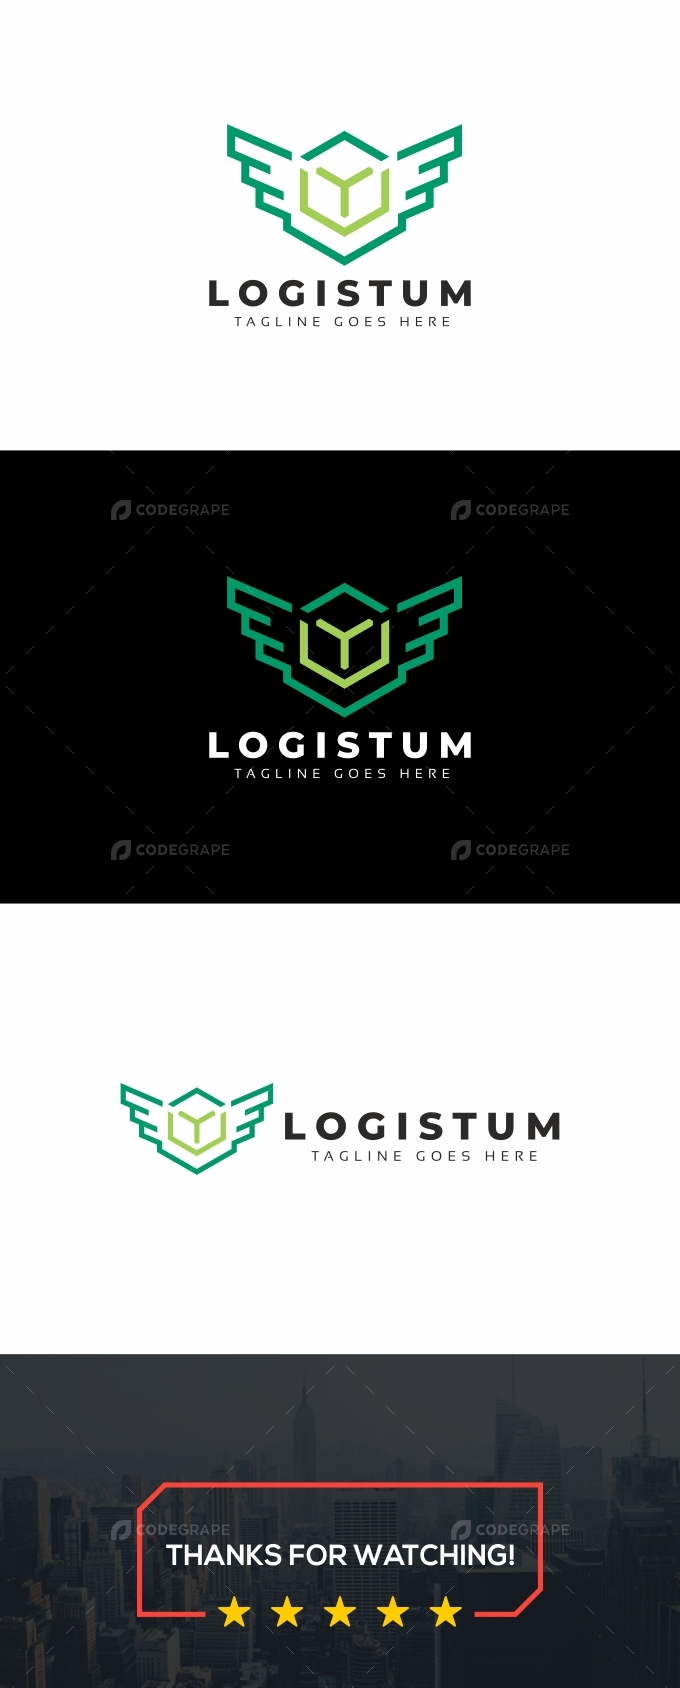 Logistics Hexagon Wings Logo